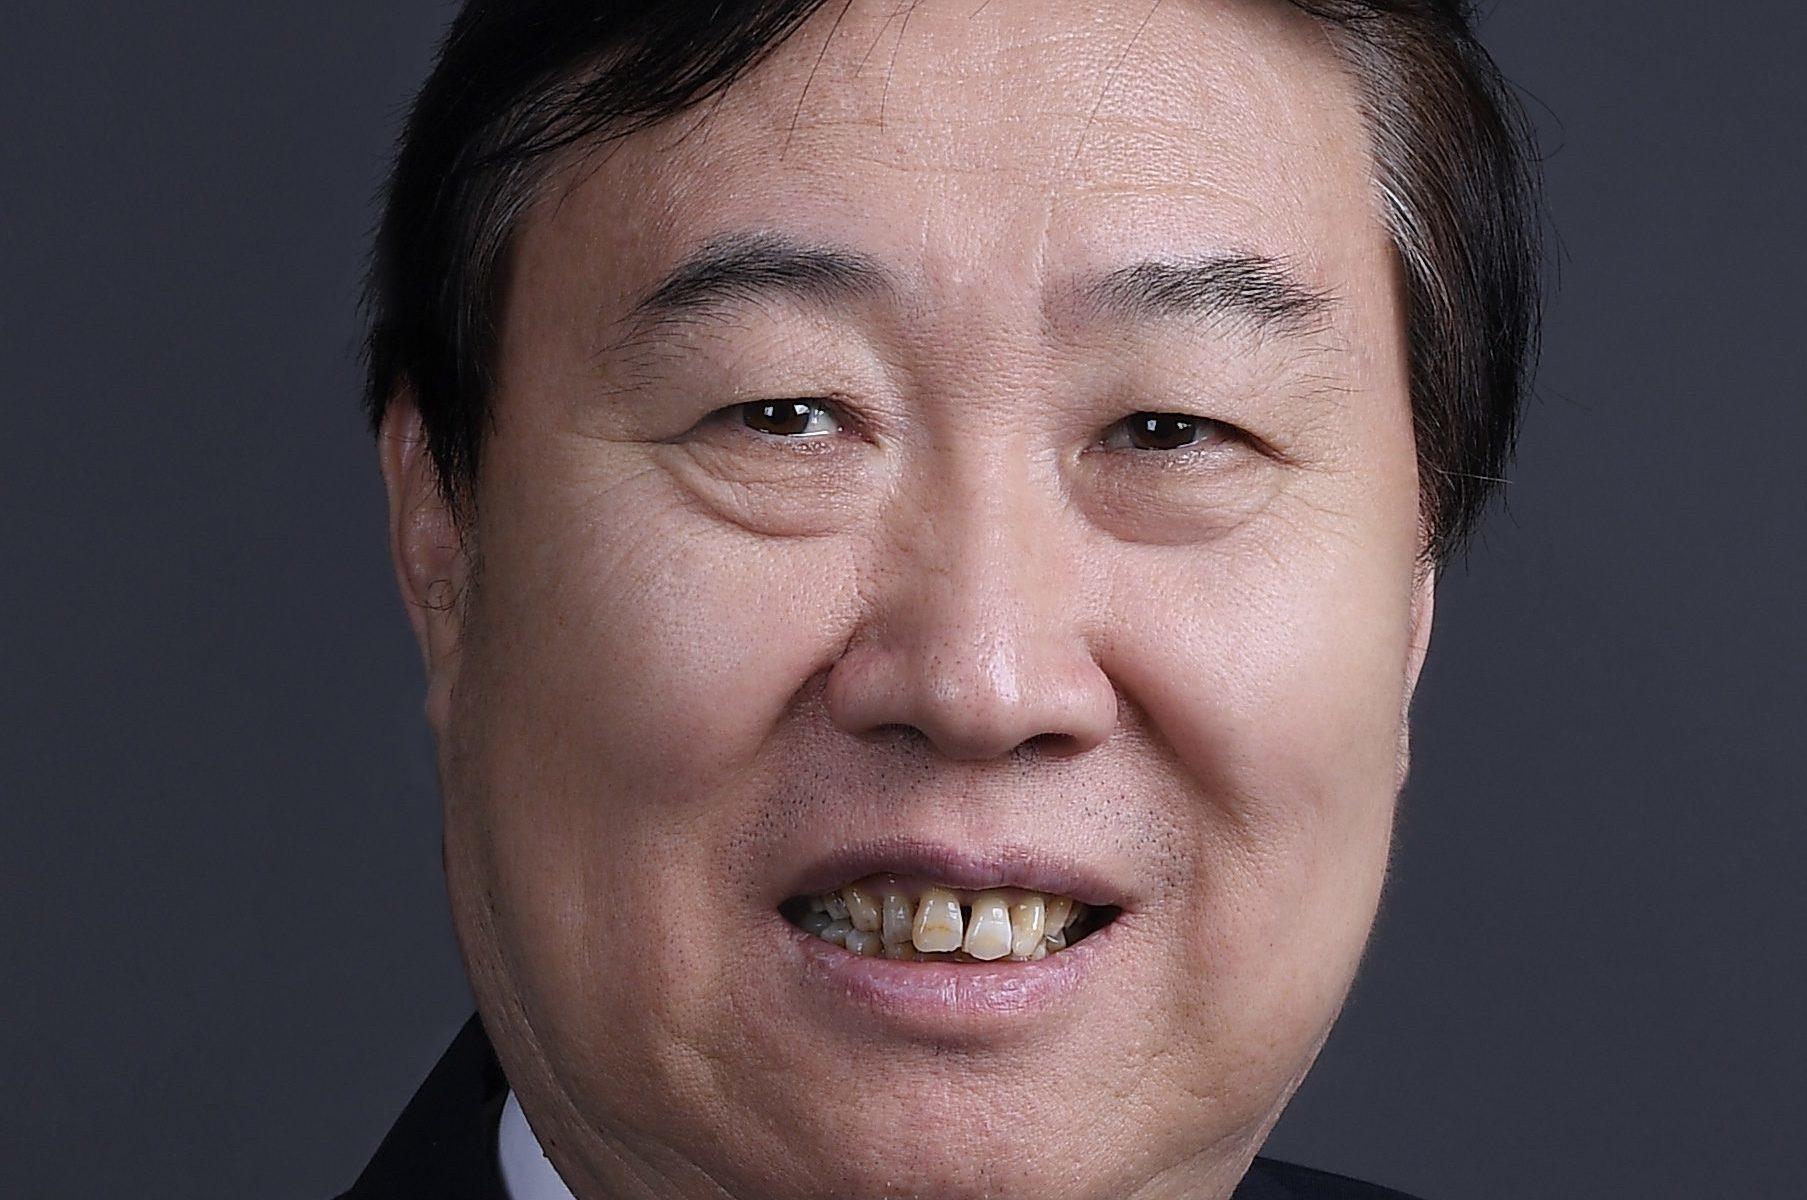 Bojie Fu